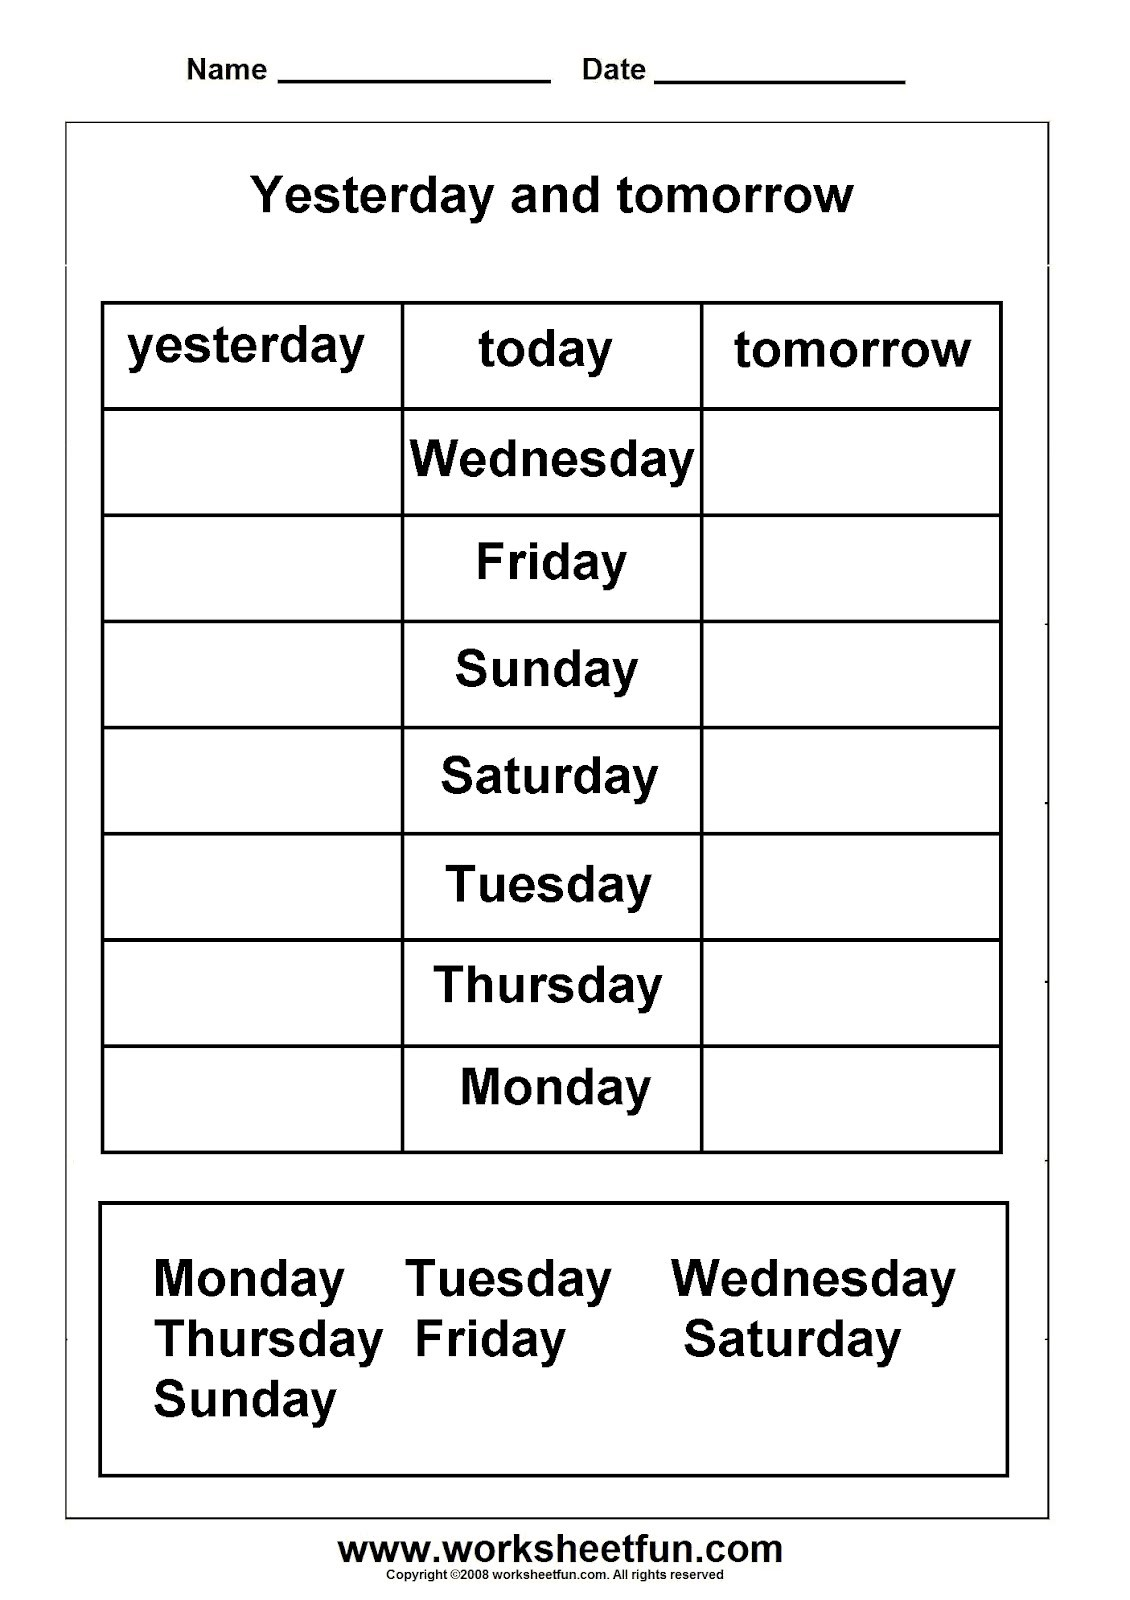 Grade 1 Spelling Worksheets